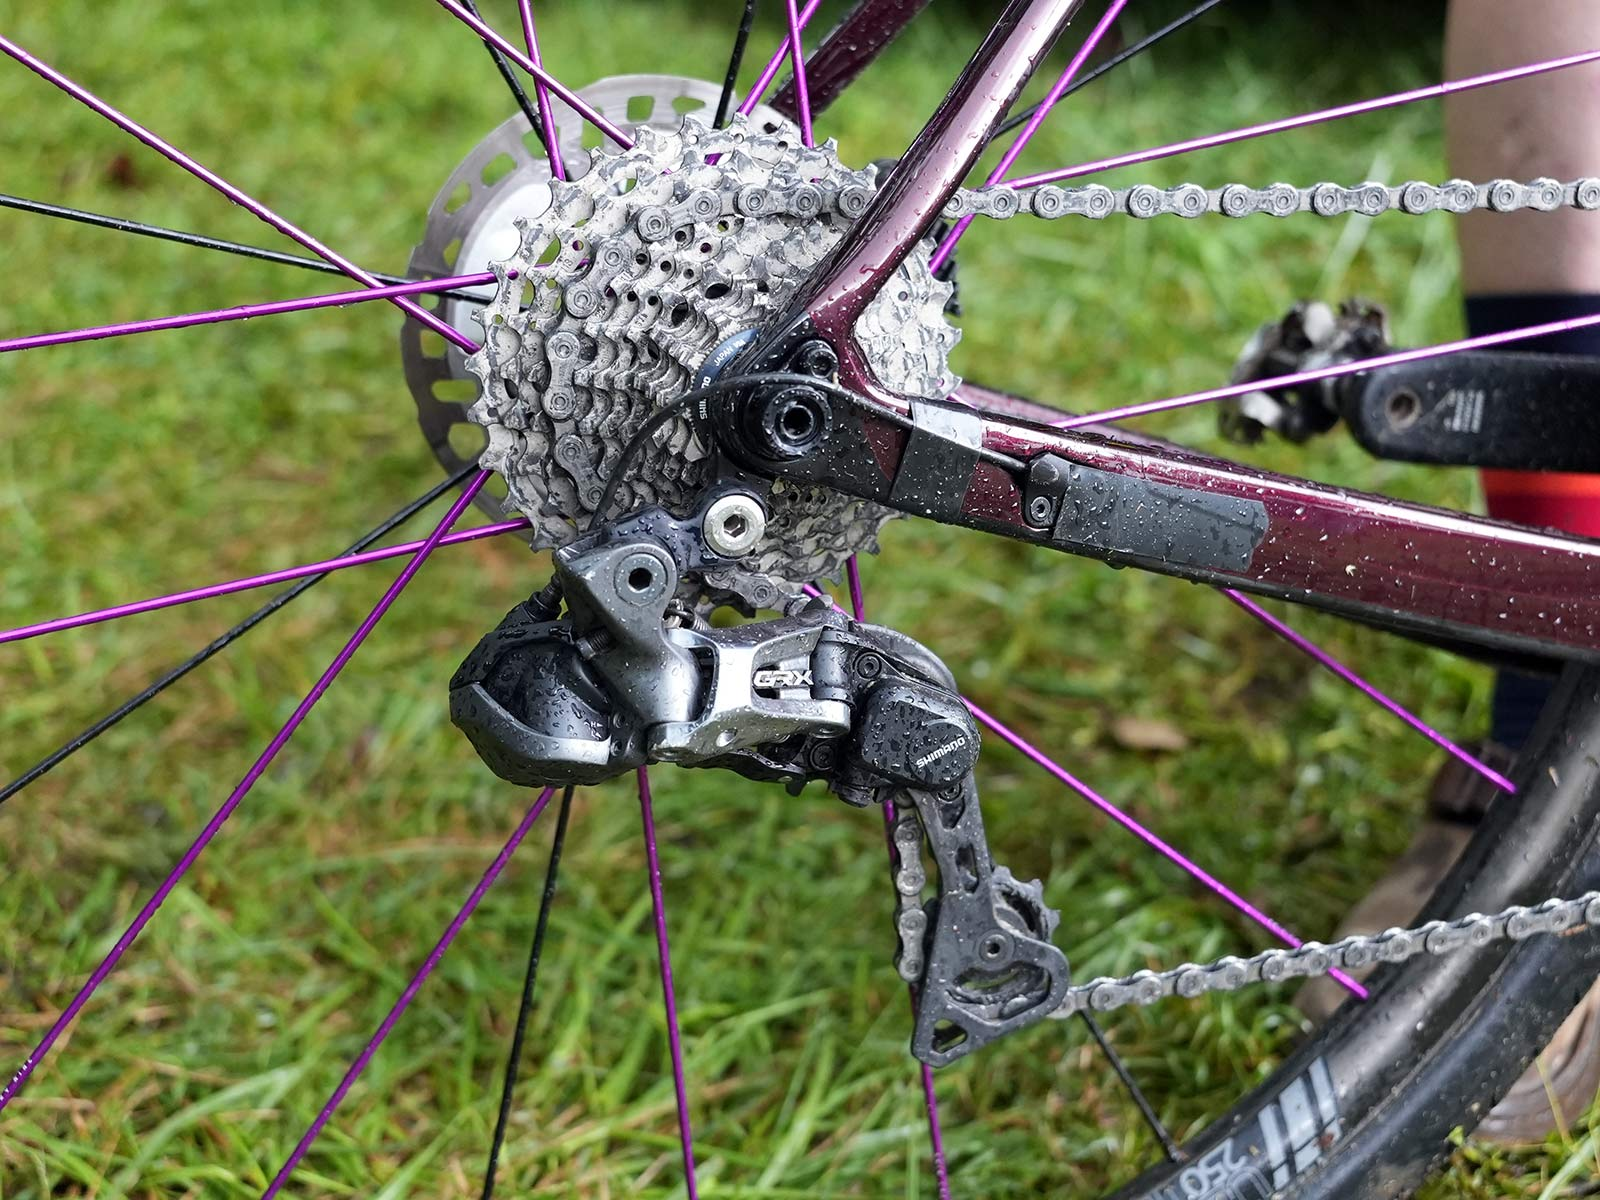 shimano grx drivetrain spec closeup on gordon wadsworth's pivot vault gravel race bike